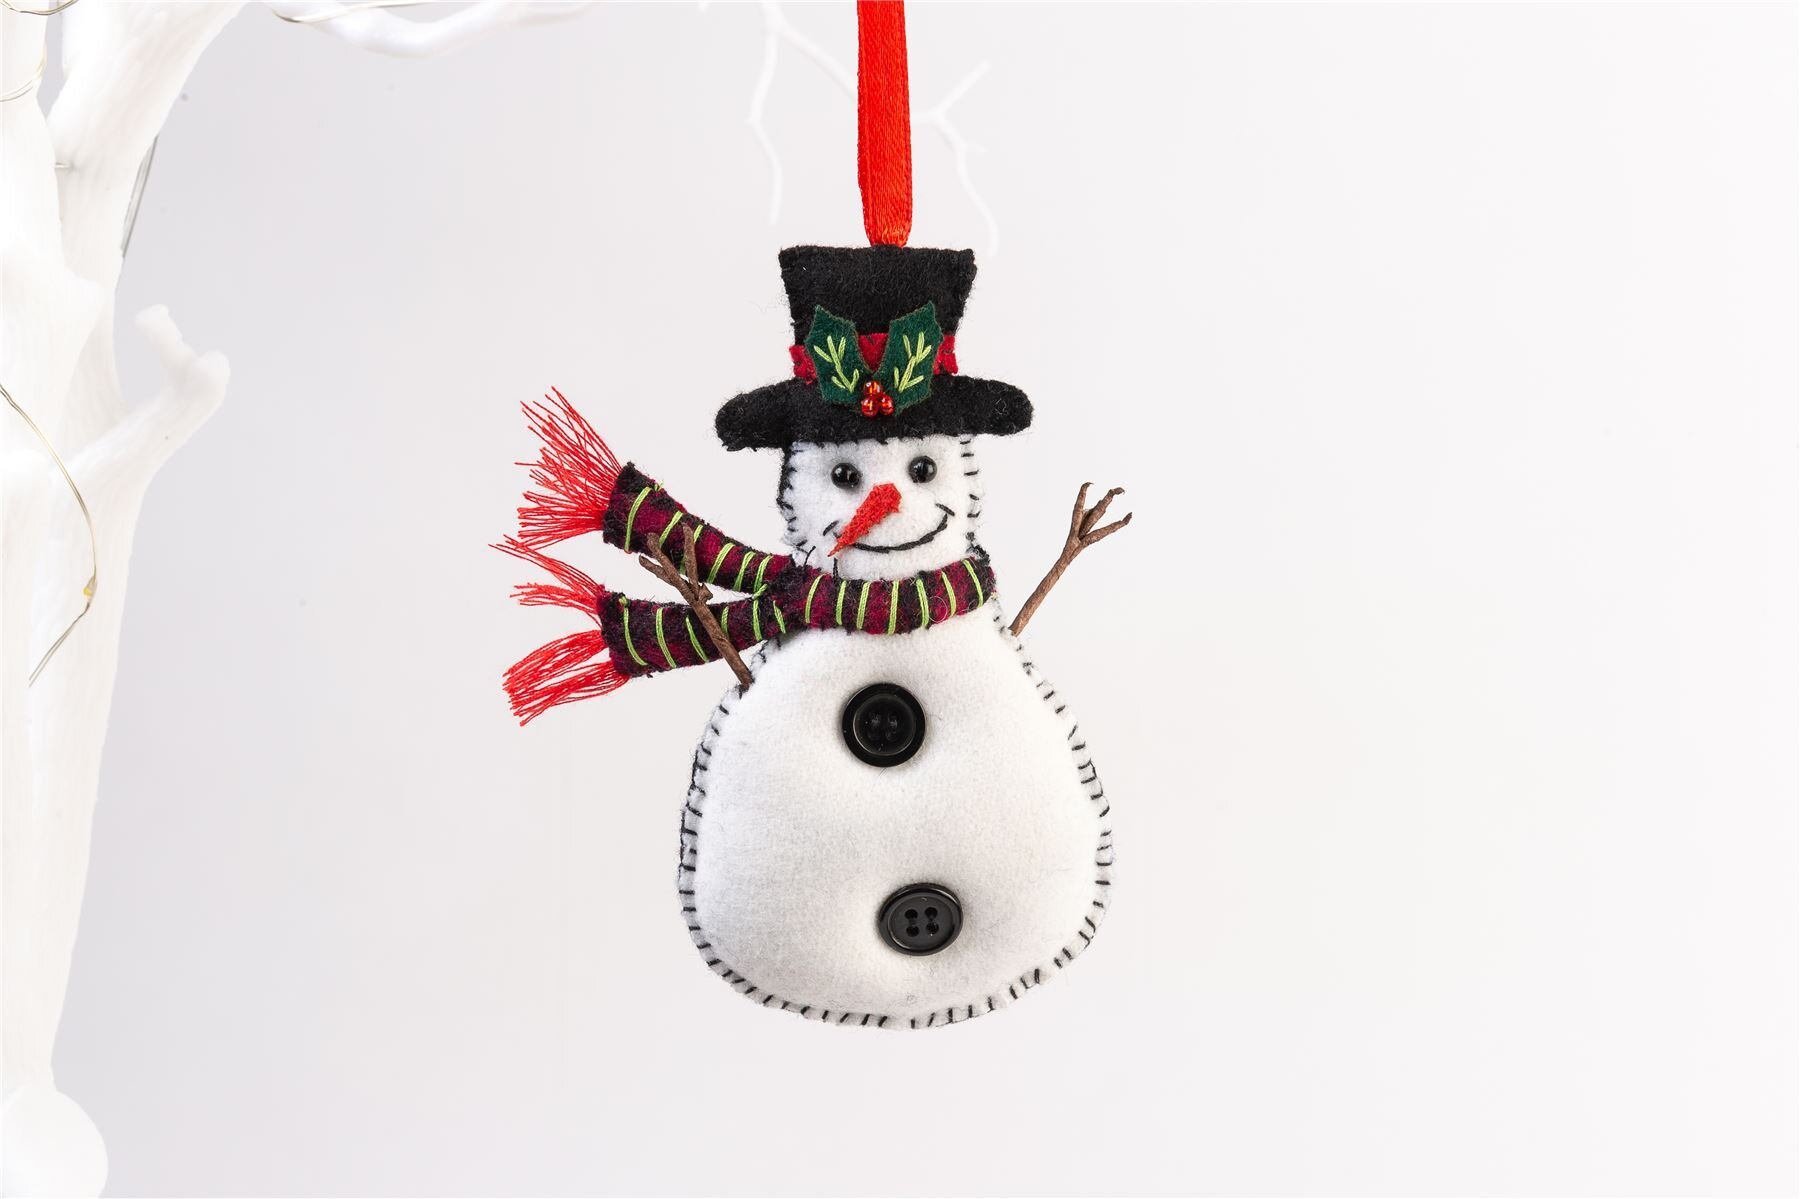 The Seasonal Aisle Snowman Christmas Tree Hanging Figurine Ornament Wayfair Co Uk